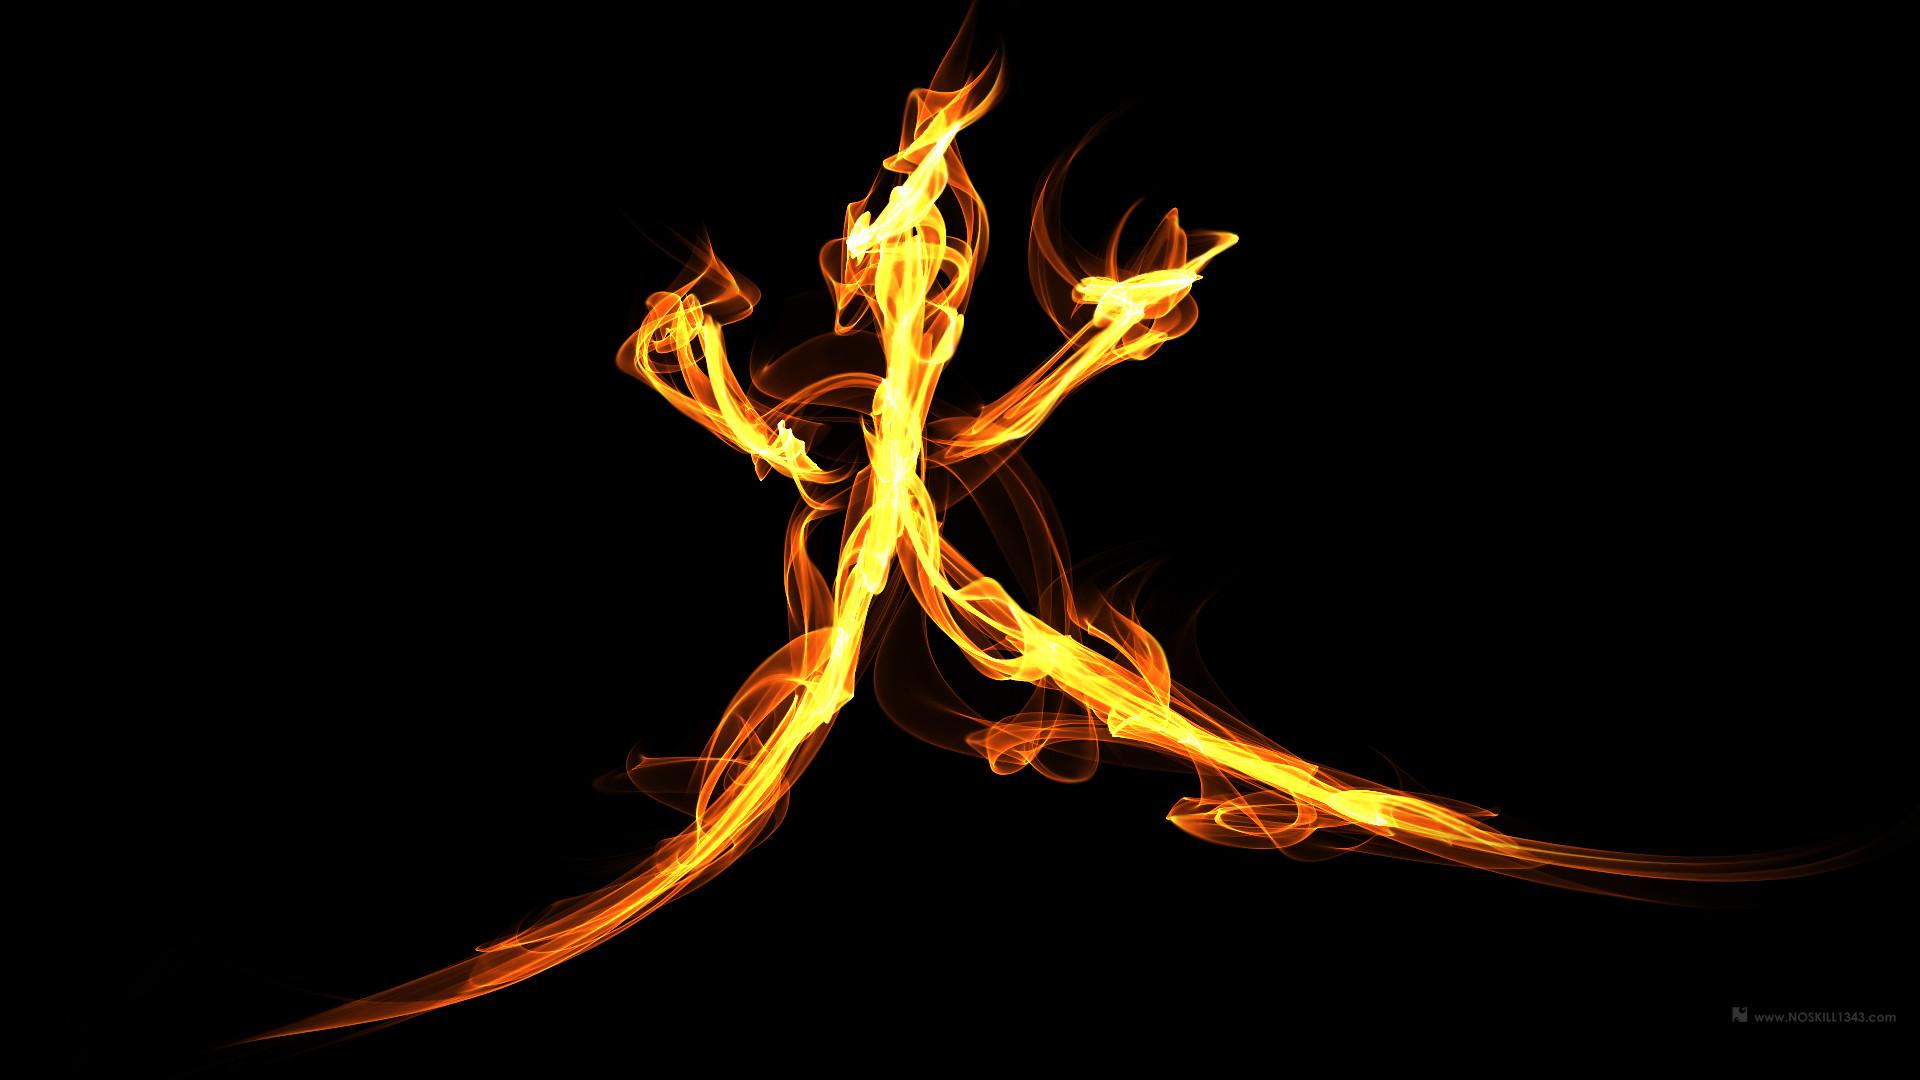 Free Wallpaper Fire Hi Kanji by nosKILL1343 on DeviantArt